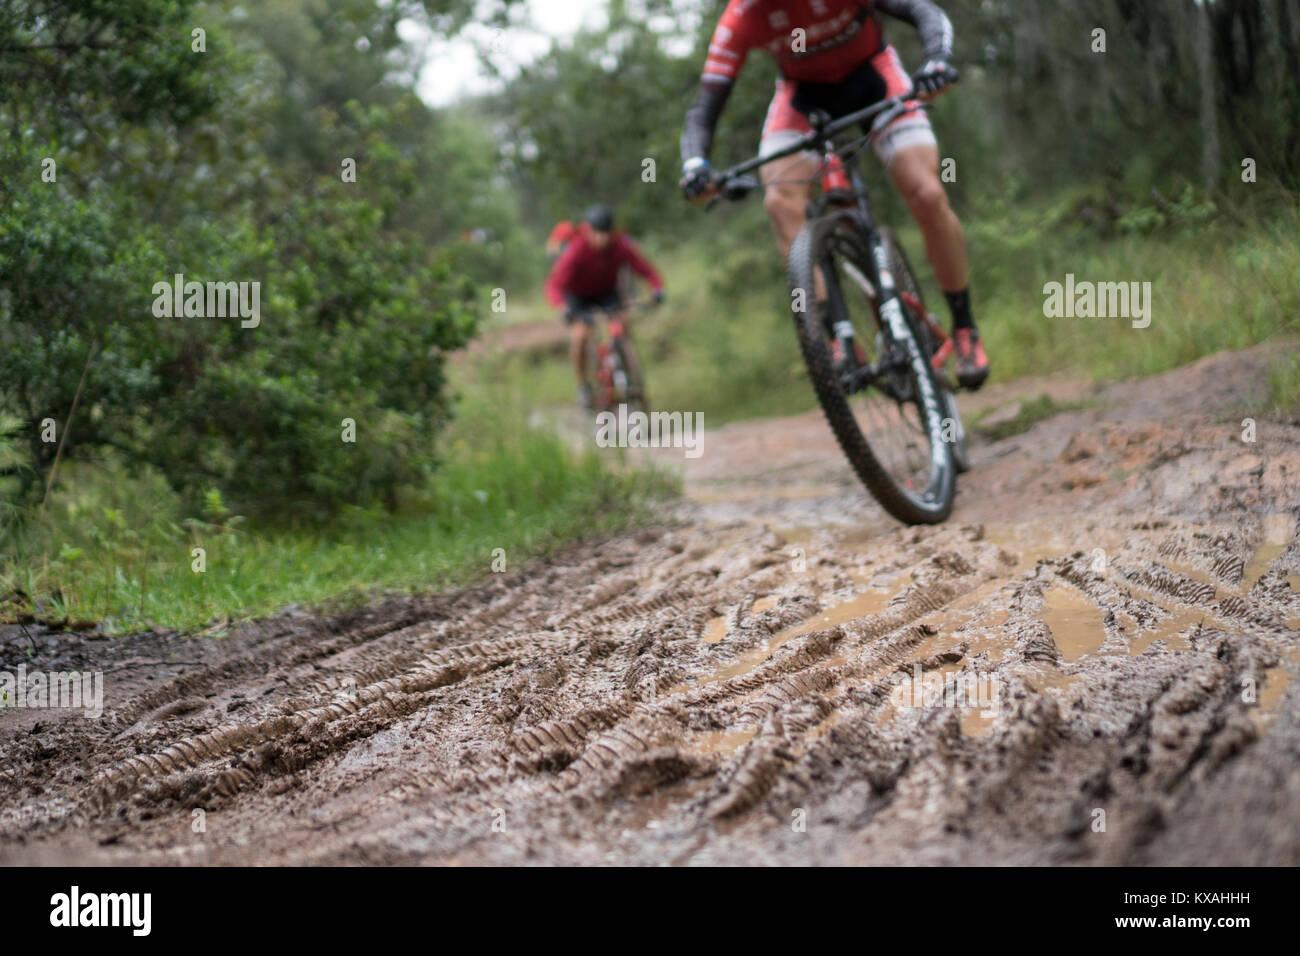 Two men riding mountain bikes on mud, Huasca de Ocampo, Hidalgo, Mexico - Stock Image